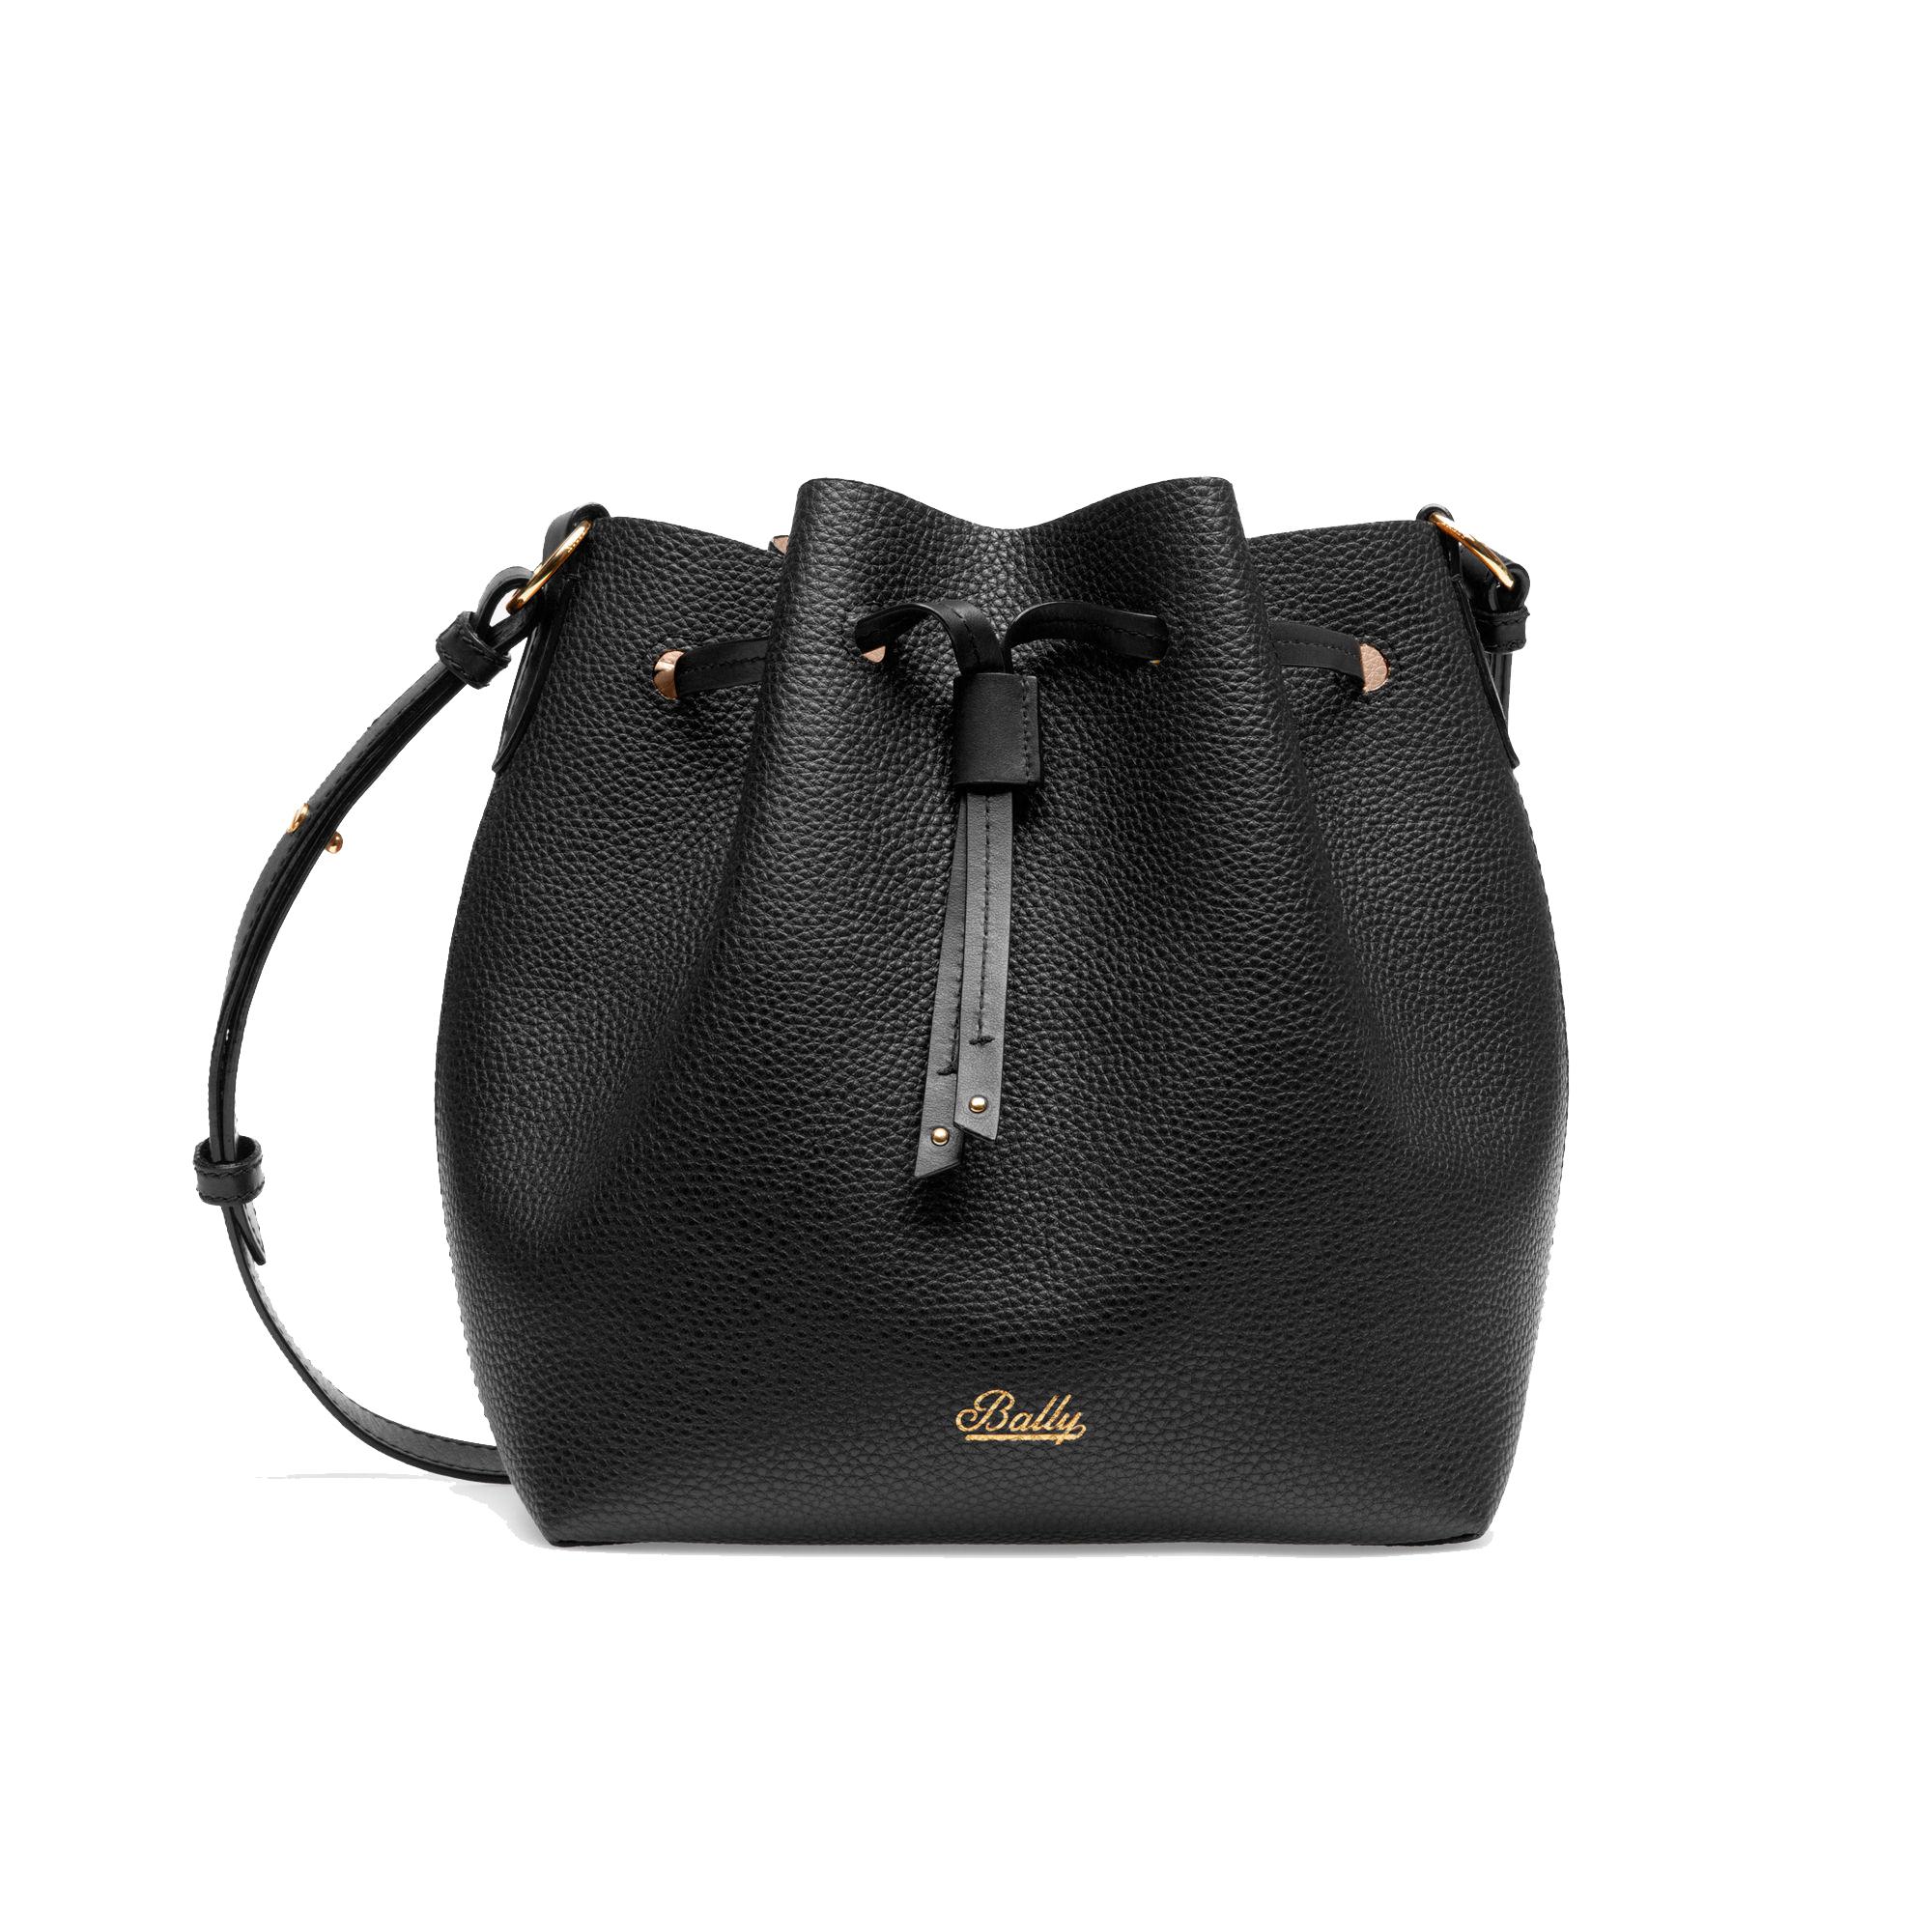 Bally Raine Crossbody Bucket Bag